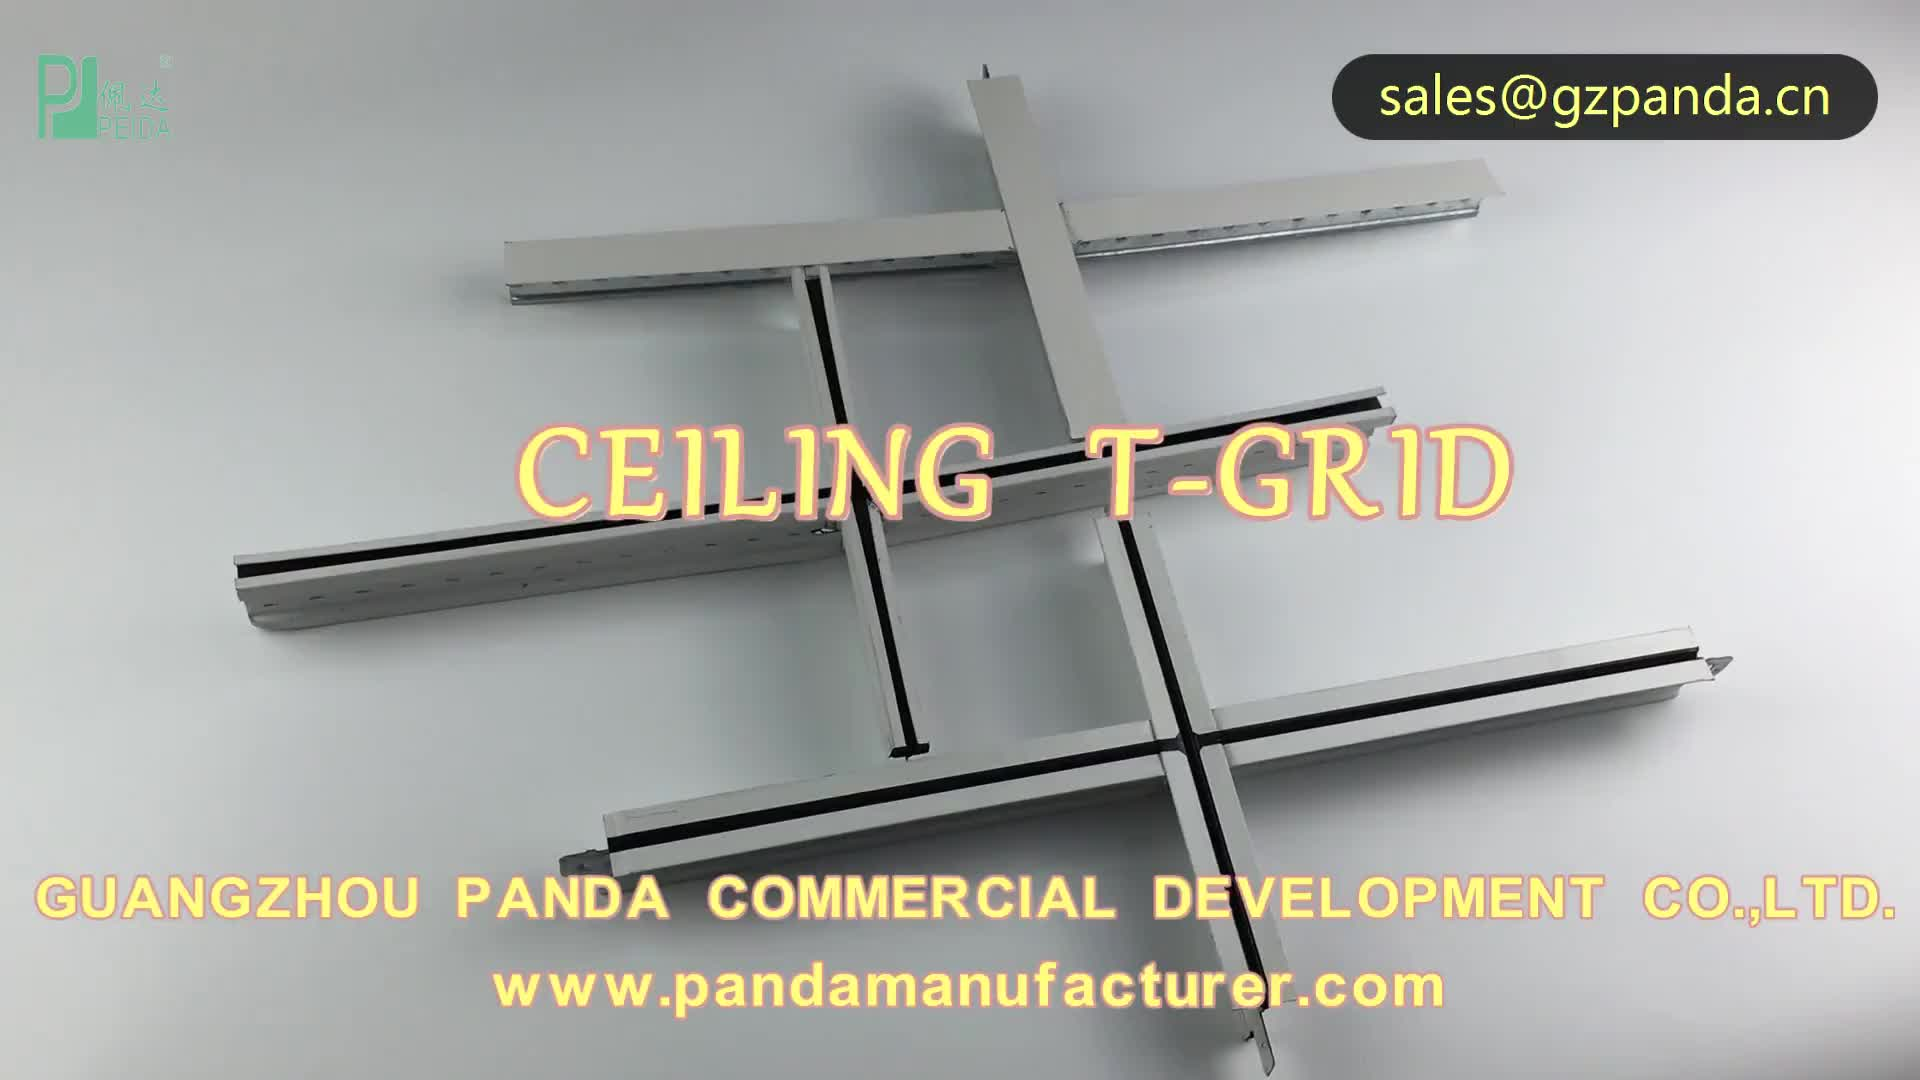 Galvanized Ceiling Framing T Grid for PVC Gypsum Board